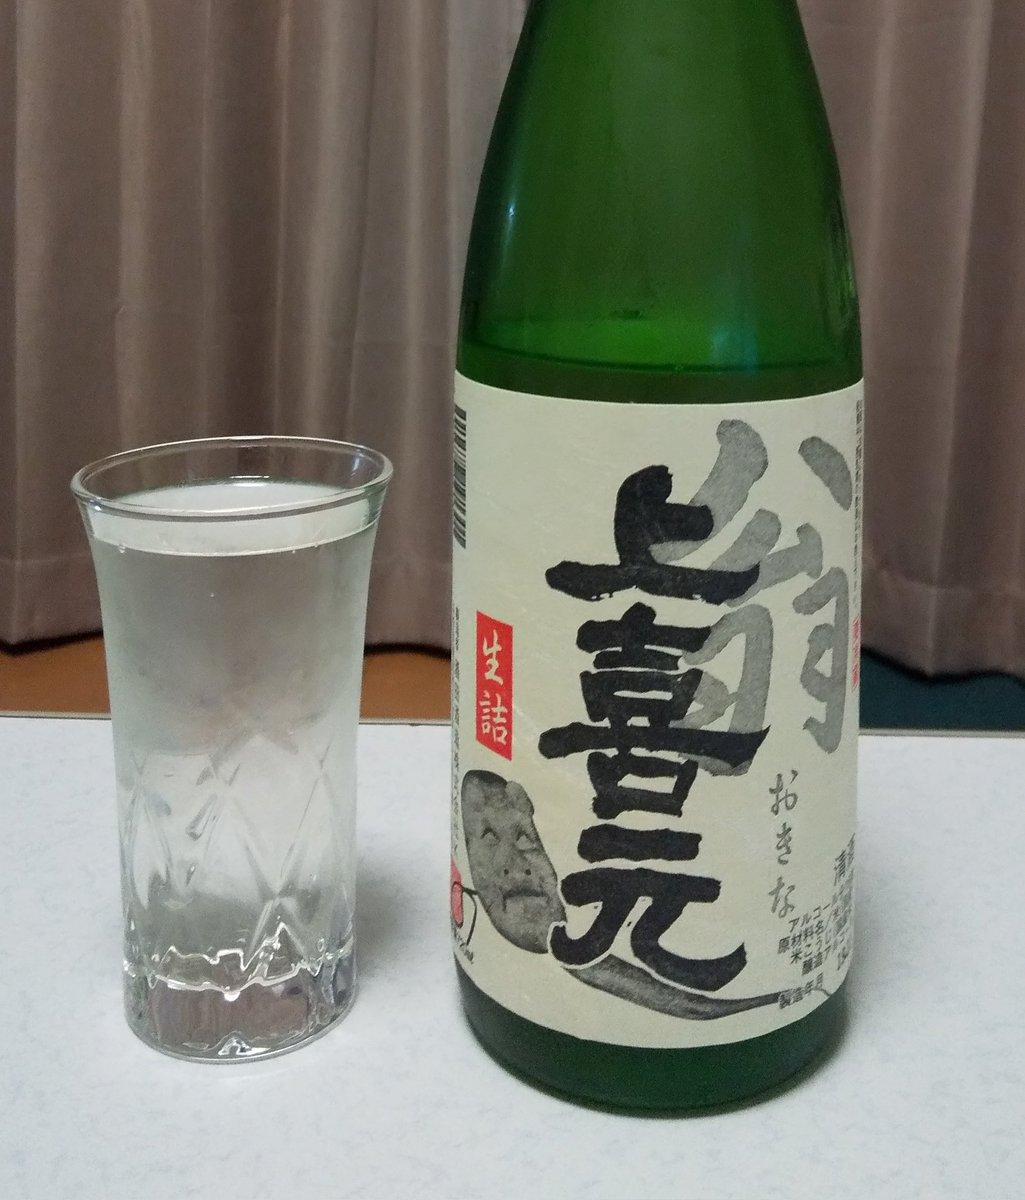 test ツイッターメディア - 「上喜元 翁」 スペック完全非公開、地元に感謝のハイコストパフォーマンス酒。 いつも美味しいお酒をありがとう✨ #上喜元 #酒田酒造 https://t.co/aj7uJJii98